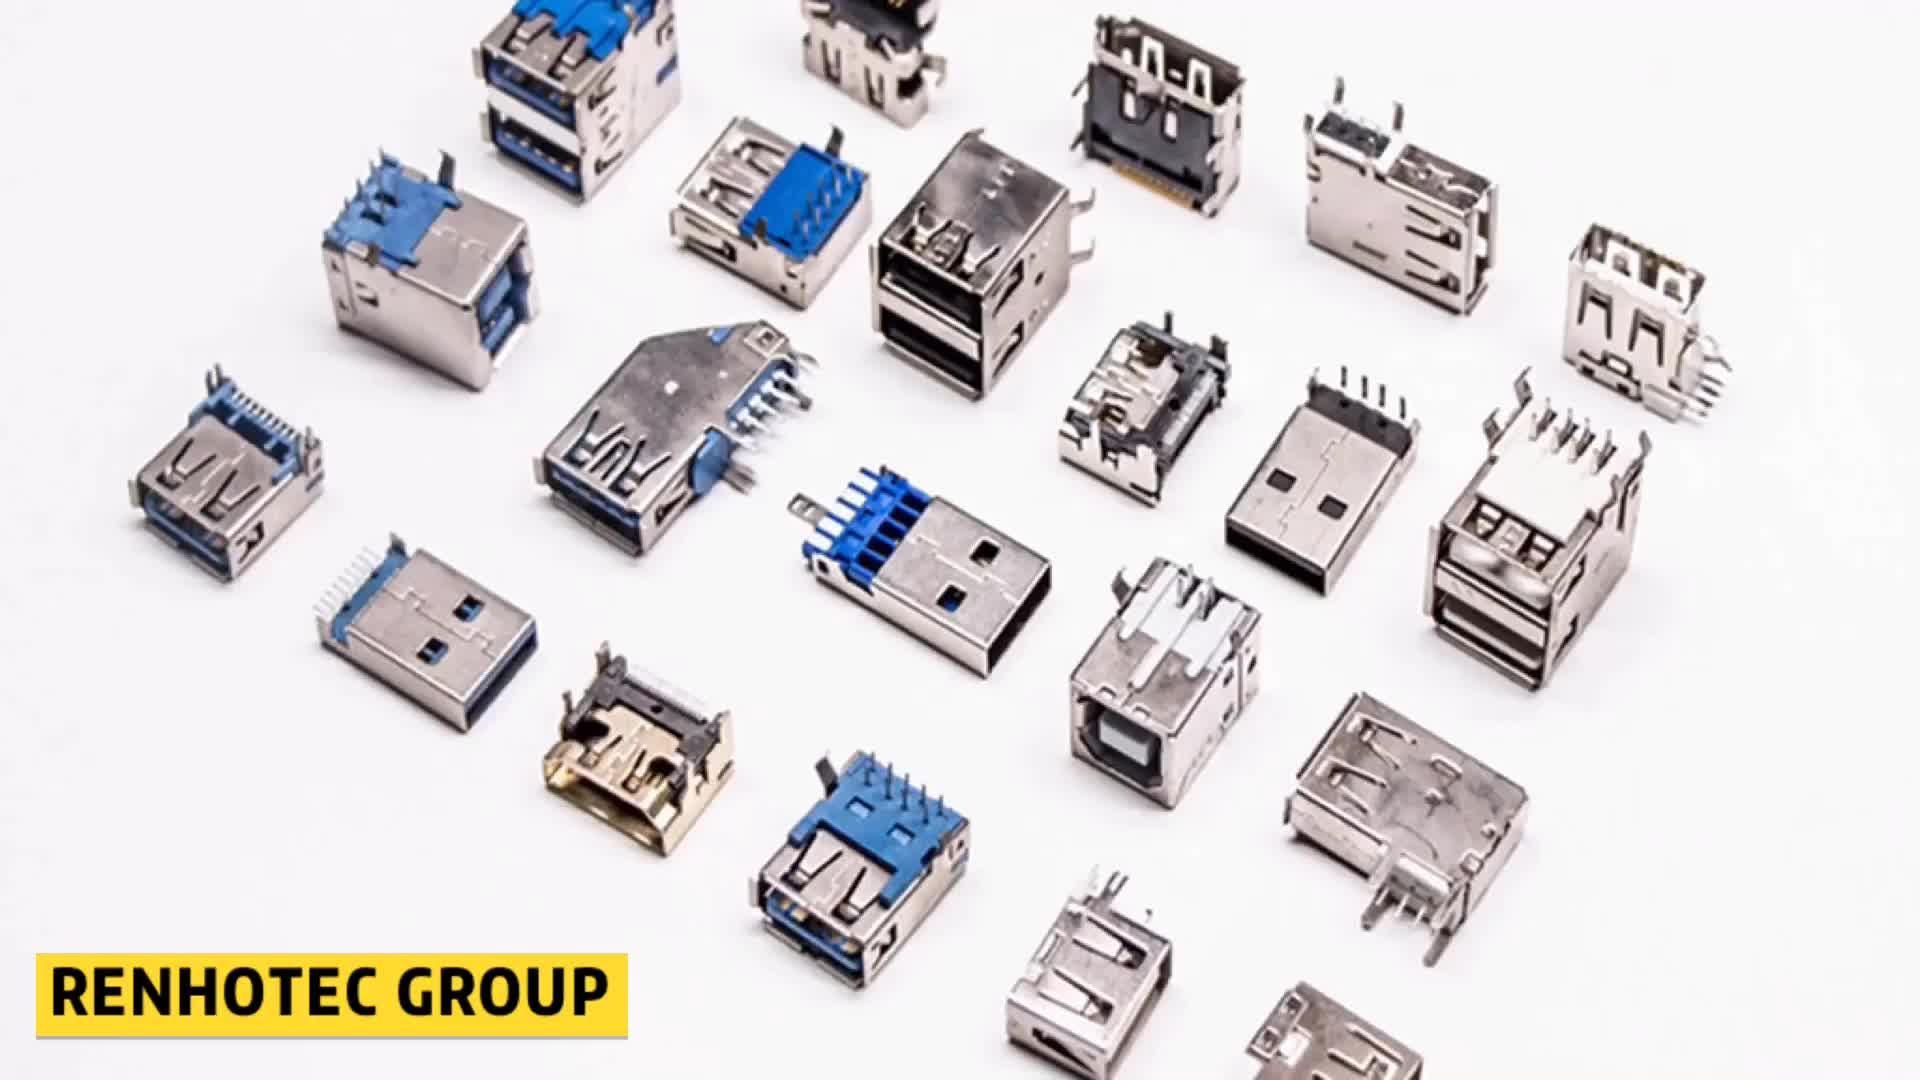 Buchse 90 Grad Flagge Typ Durch Loch USB Typ C Stecker